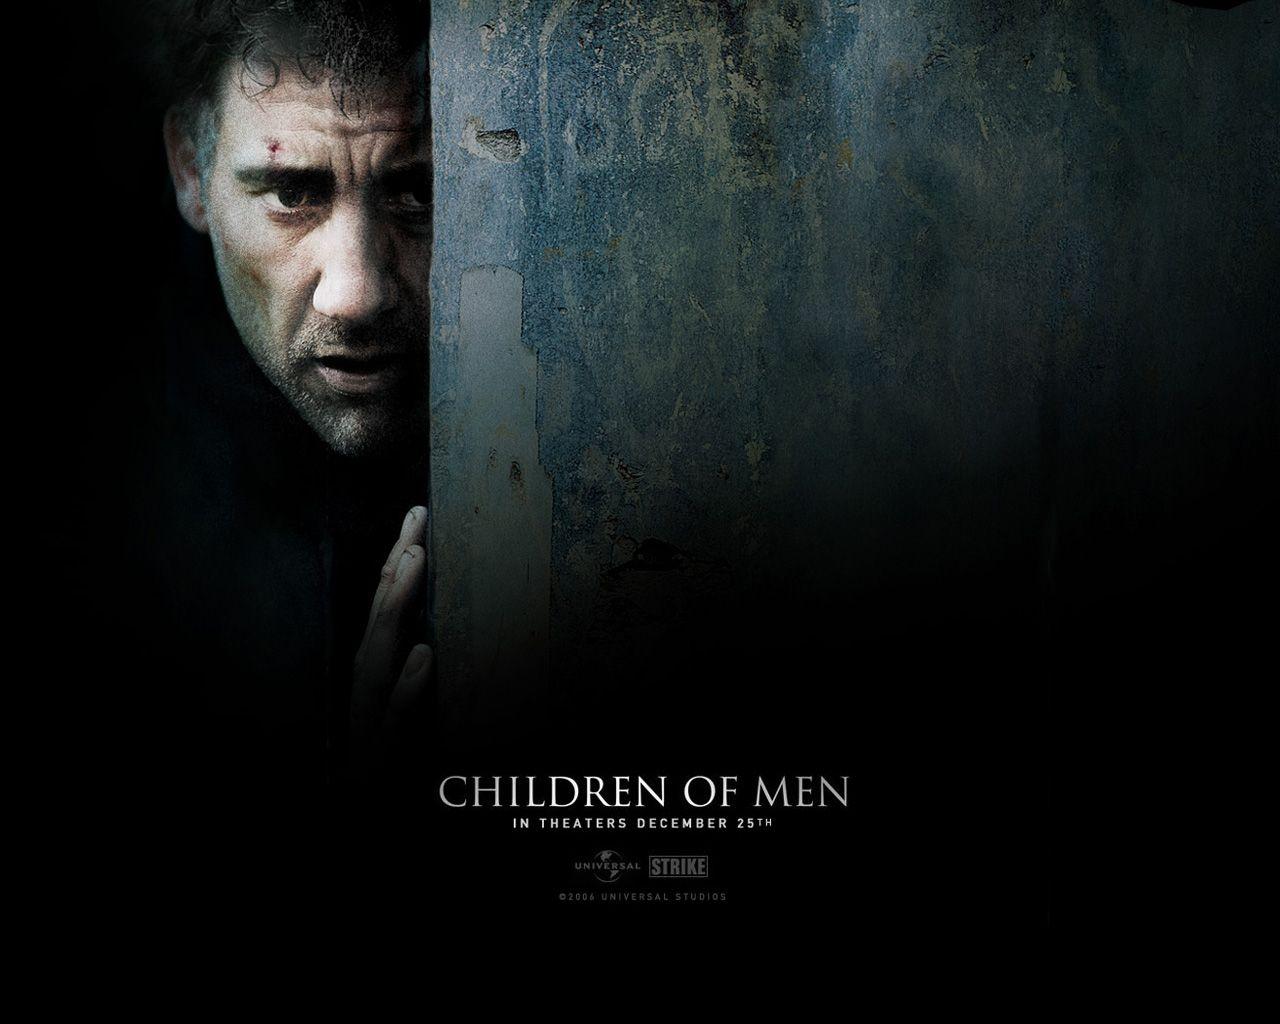 Children Of Men Wallpaper: 1 Children Of Men 010